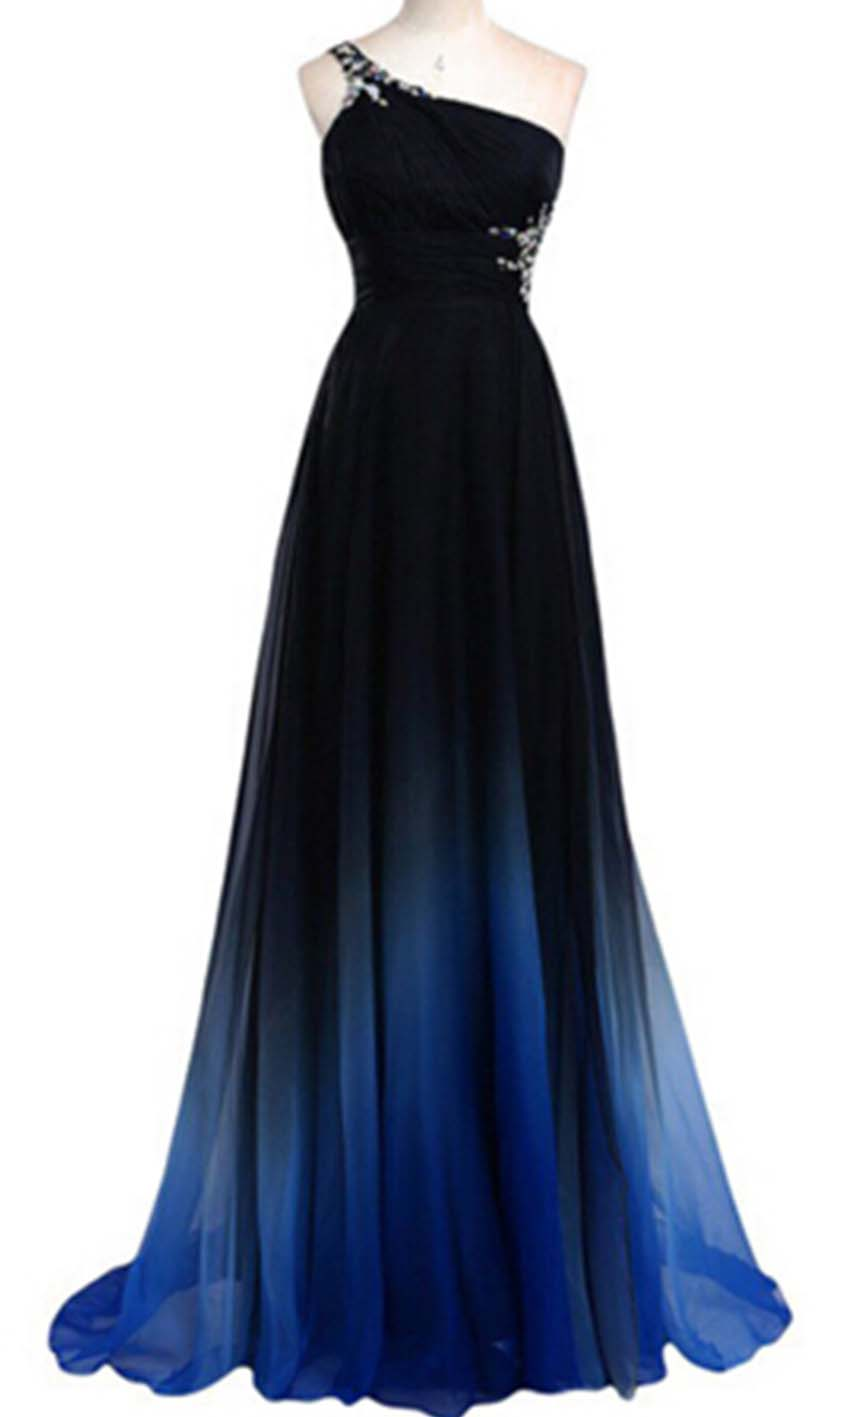 27f4ef94106 Blue Ombre One Shoulder Long Prom Dress KSP433 [KSP433] - £99.00 : Cheap Prom  Dress UK, Wedding Bridesmaid Dresses ...